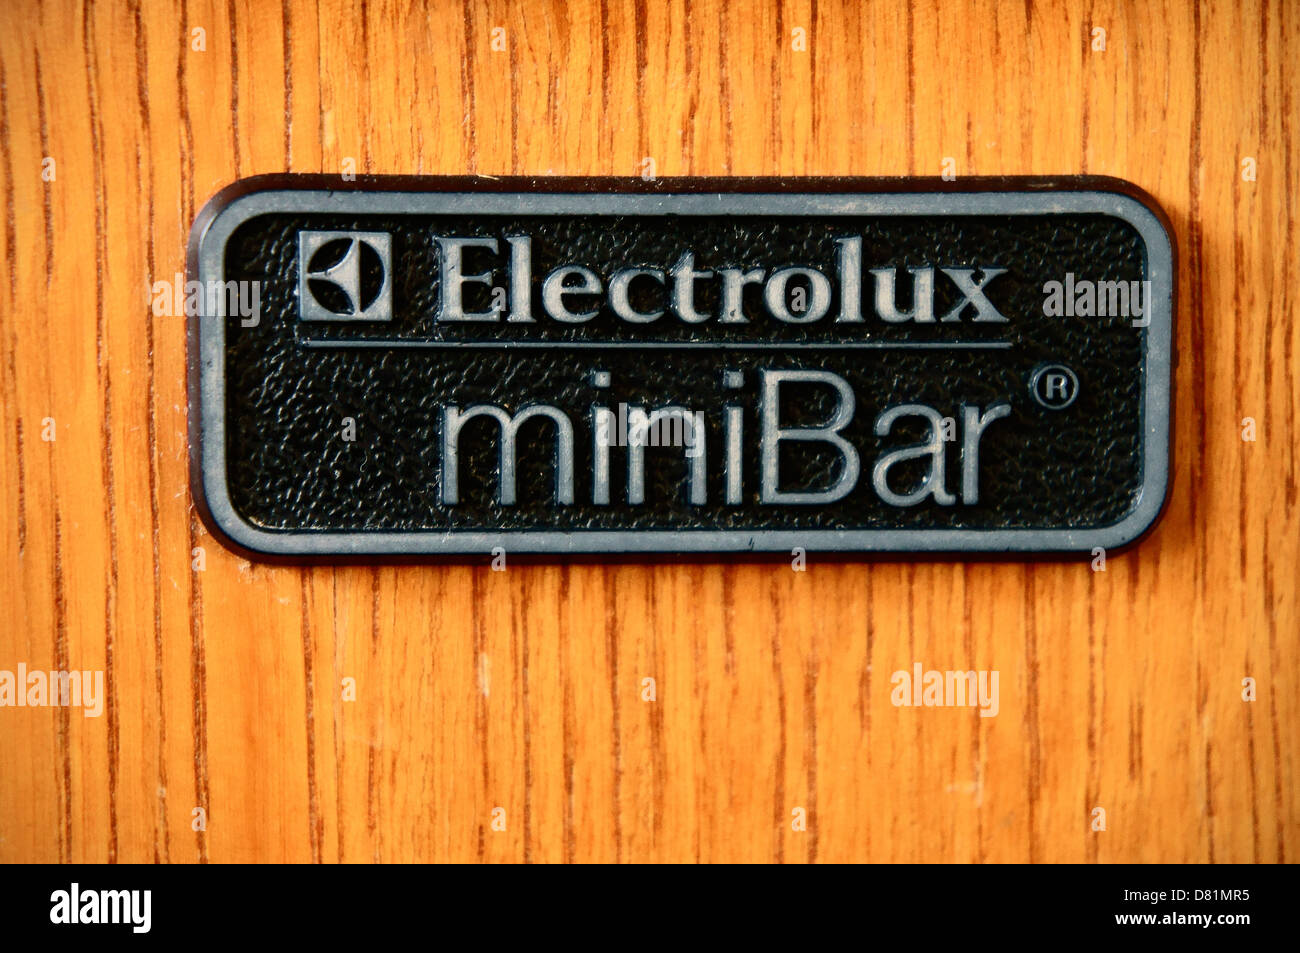 Minibar Kühlschrank Electrolux : Minibar hotelzimmer stockfotos minibar hotelzimmer bilder alamy